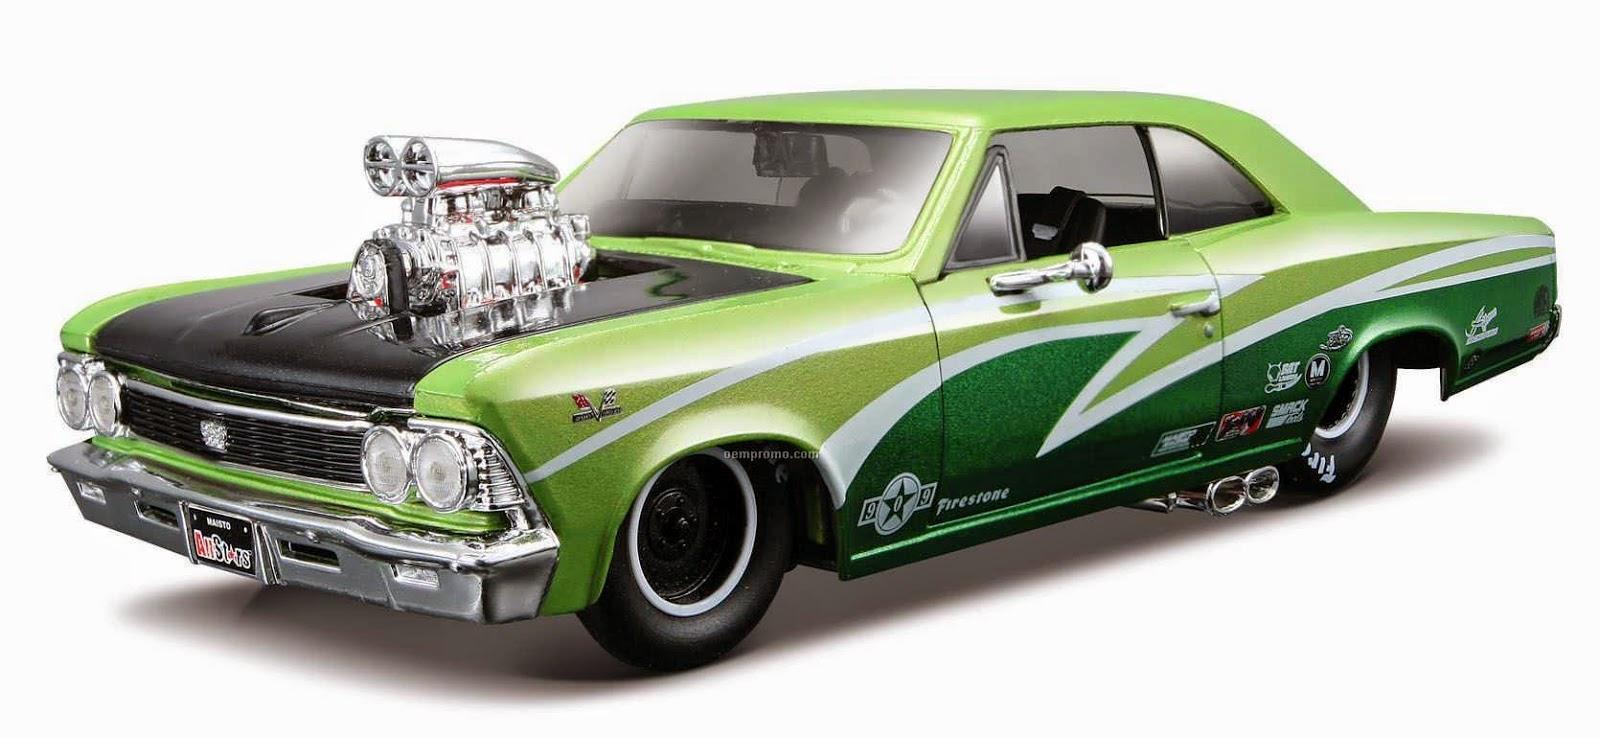 Super Sport American Muscle Classic Car Chevrolet Chevelle